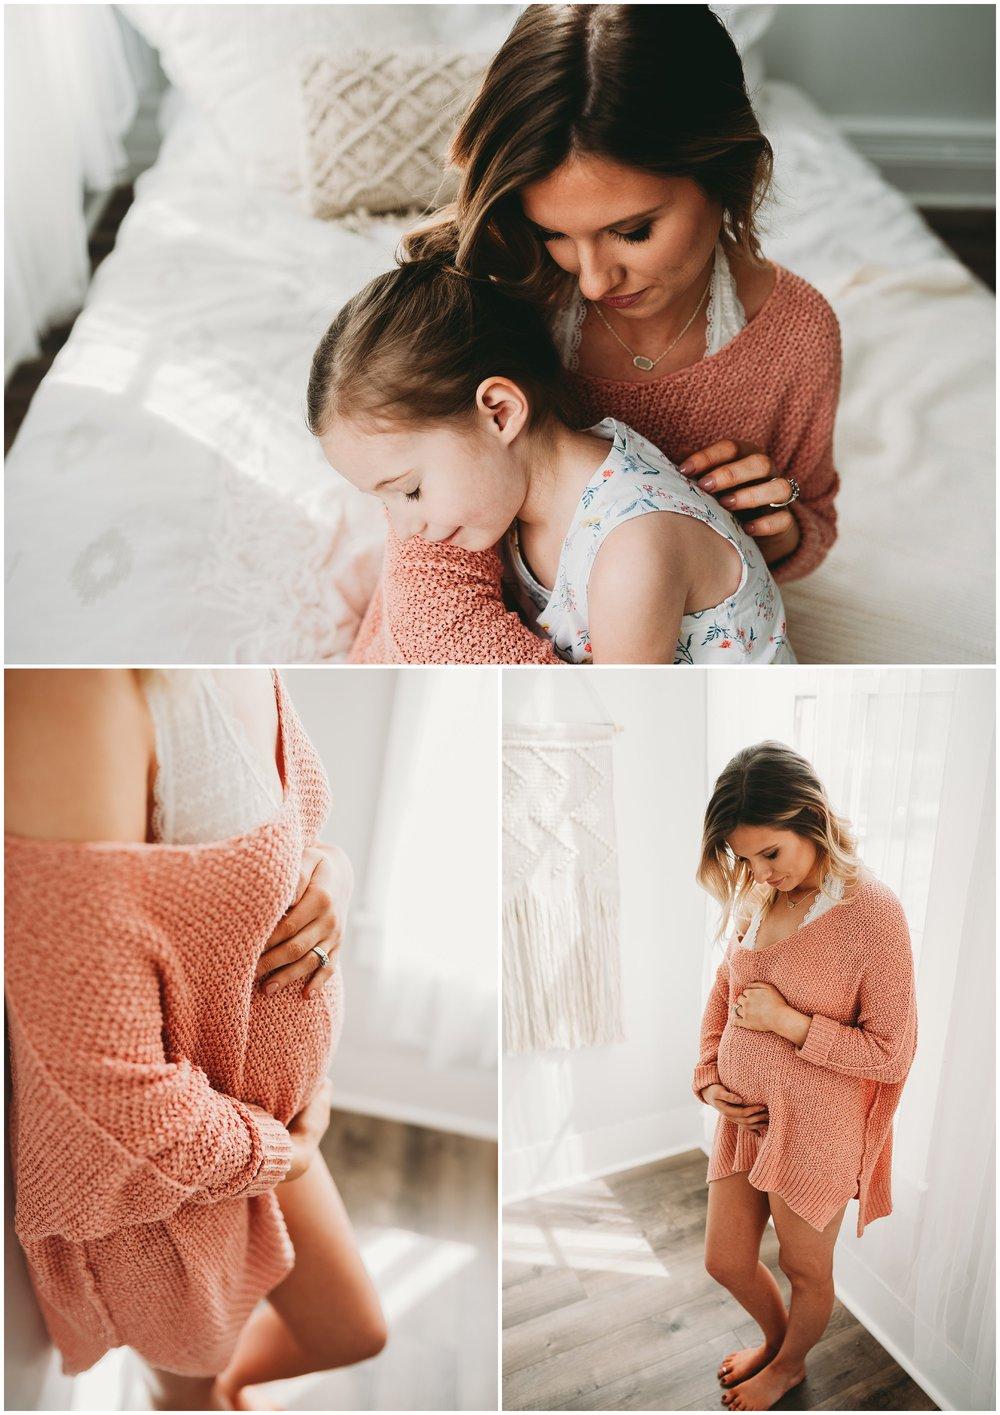 wadsworth-lifestyle-blog-motherhood_0004.jpg